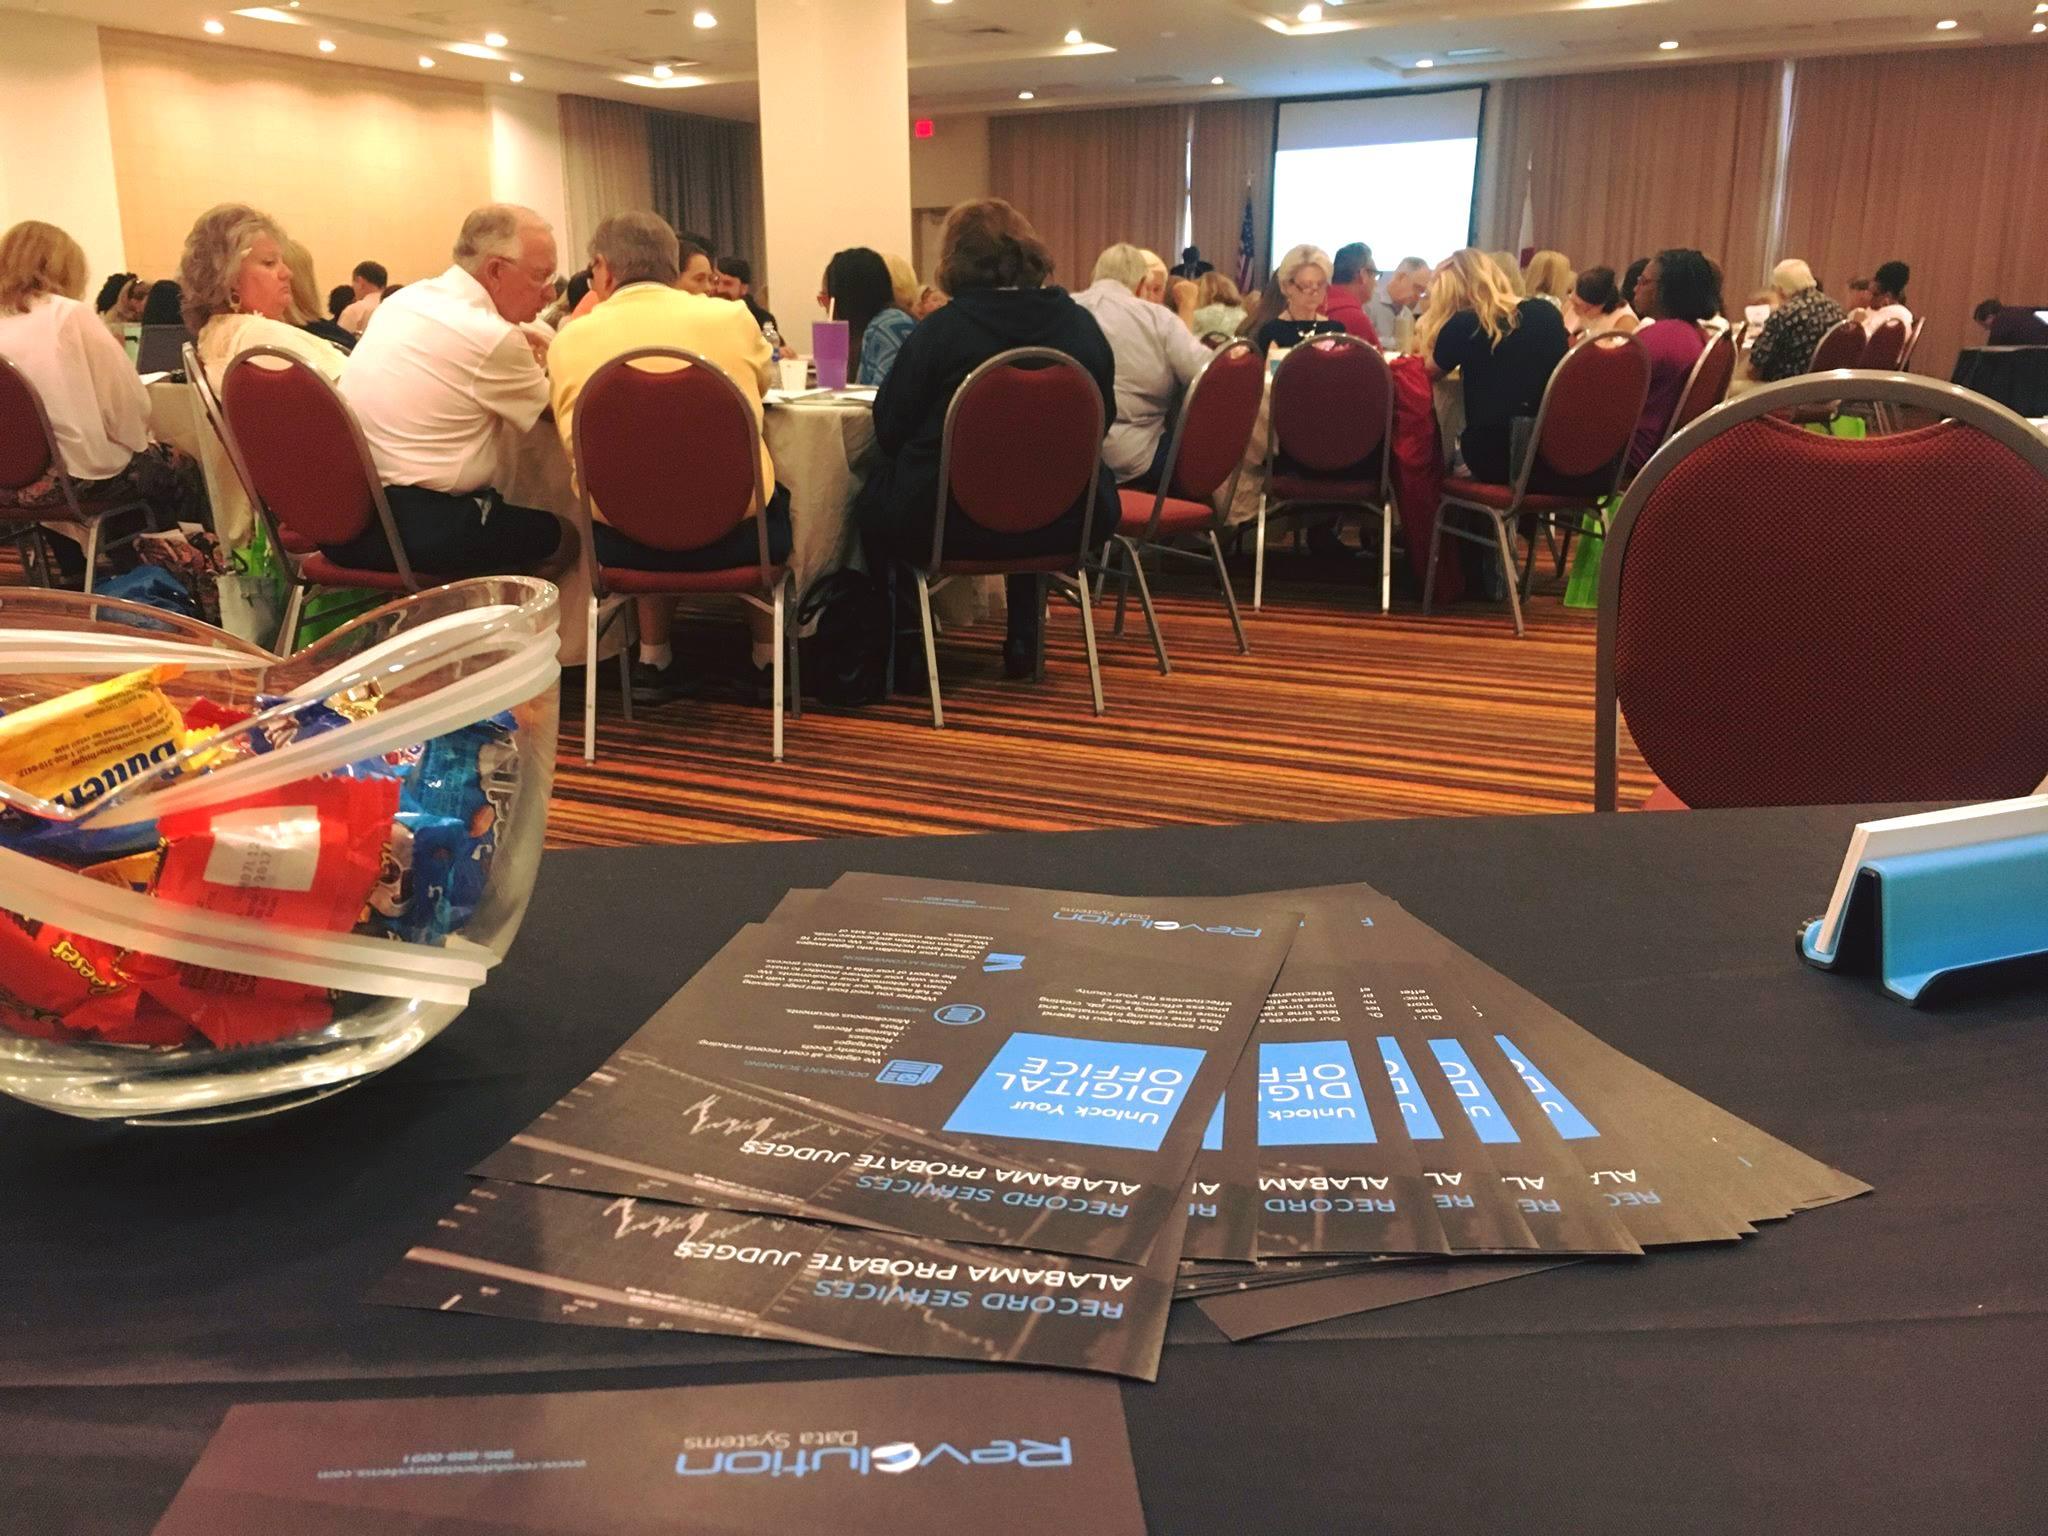 June 26 - RDS sponsors the Probate Judge conference in Mobile, AL.